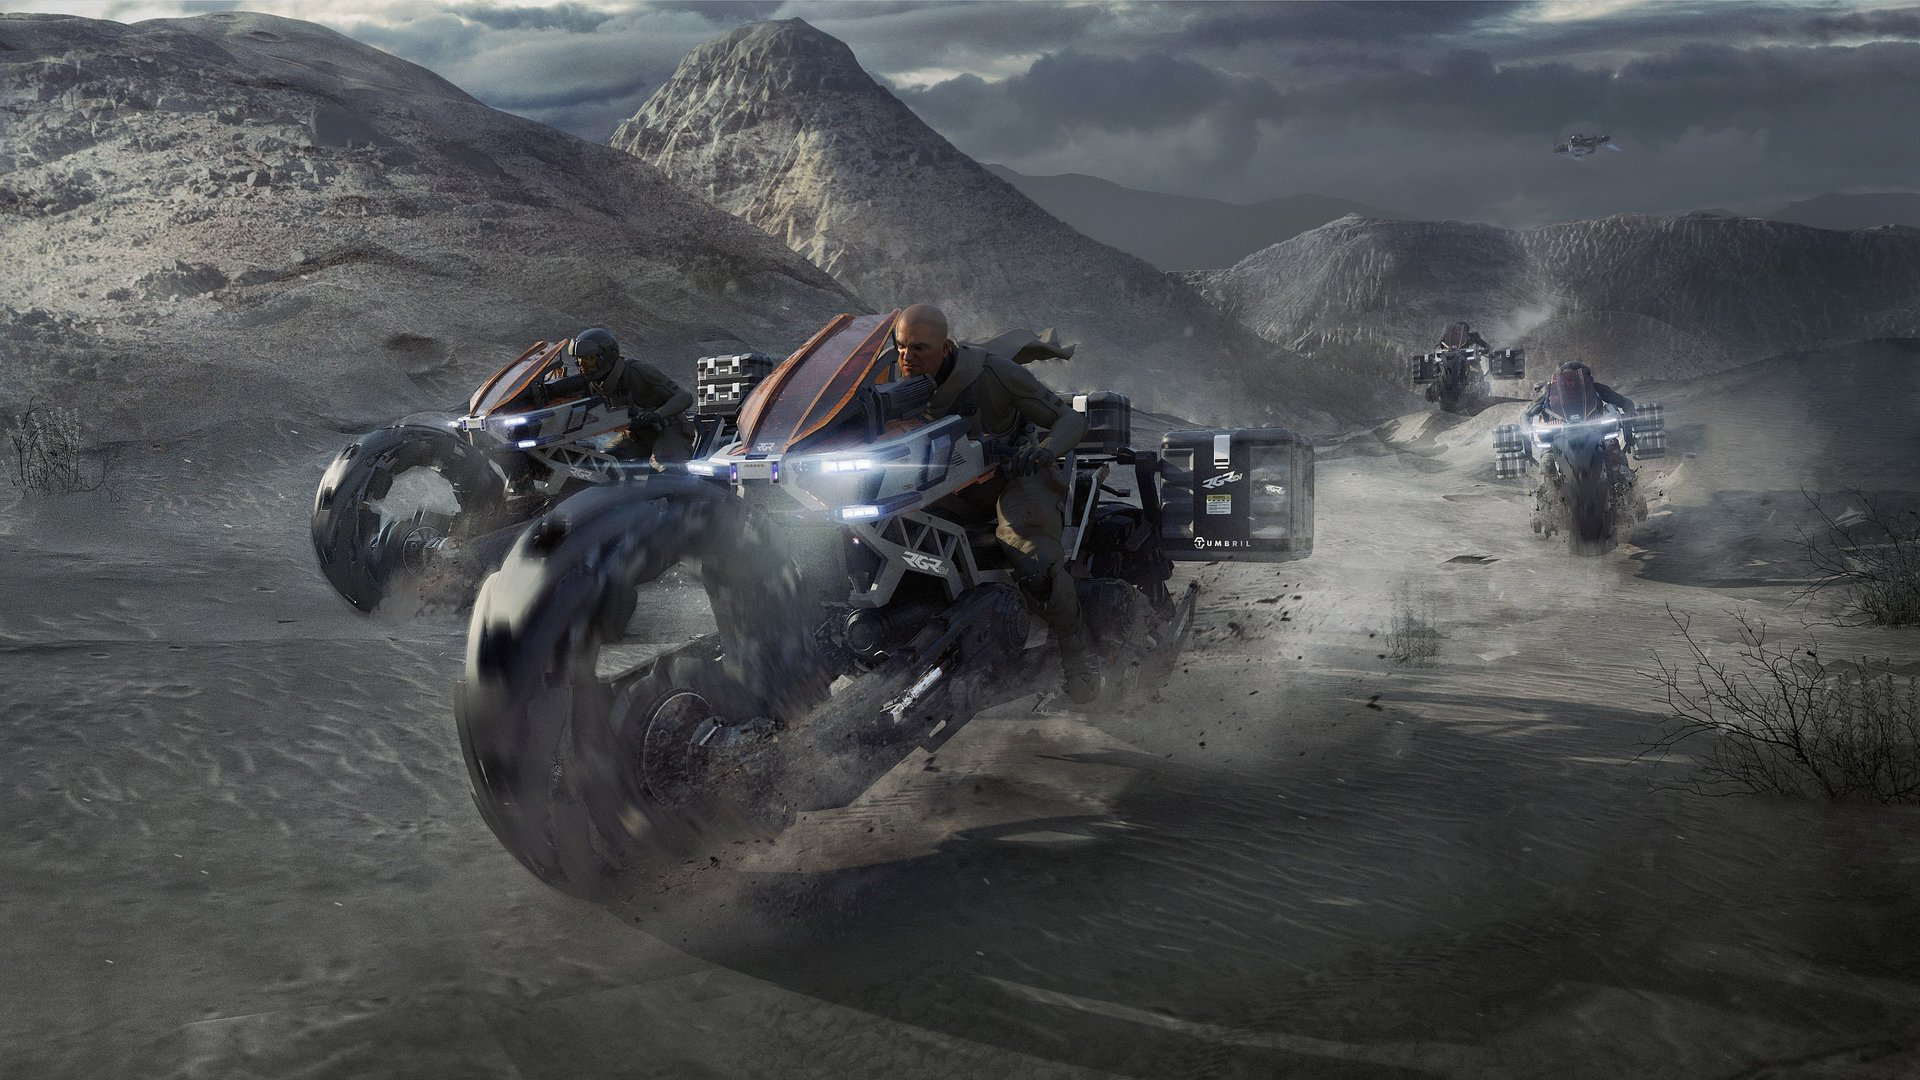 Tumbril_Ranger_Basic_Cargo_run_SM02-Min.thumb.jpg.460049120e9e2eb1b5f25c1d4af3cd3c.jpg